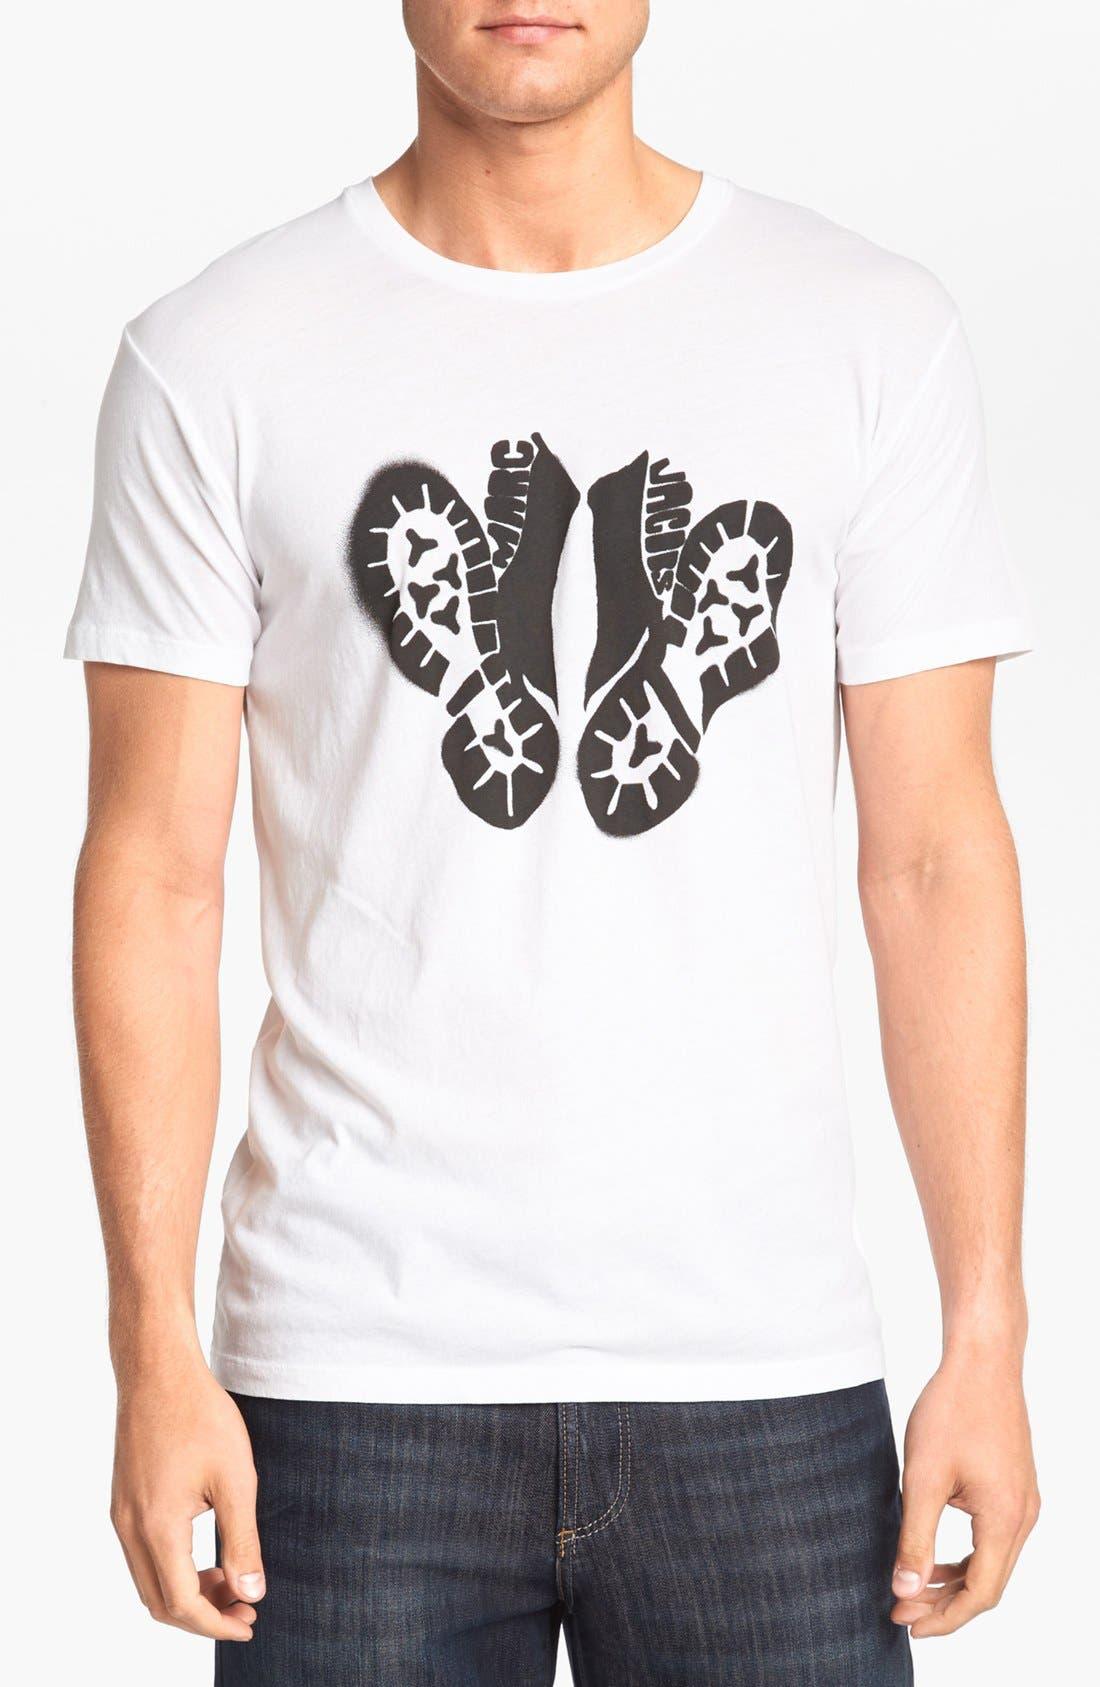 Main Image - MARC BY MARC JACOBS Stencil Boots Cotton T-Shirt